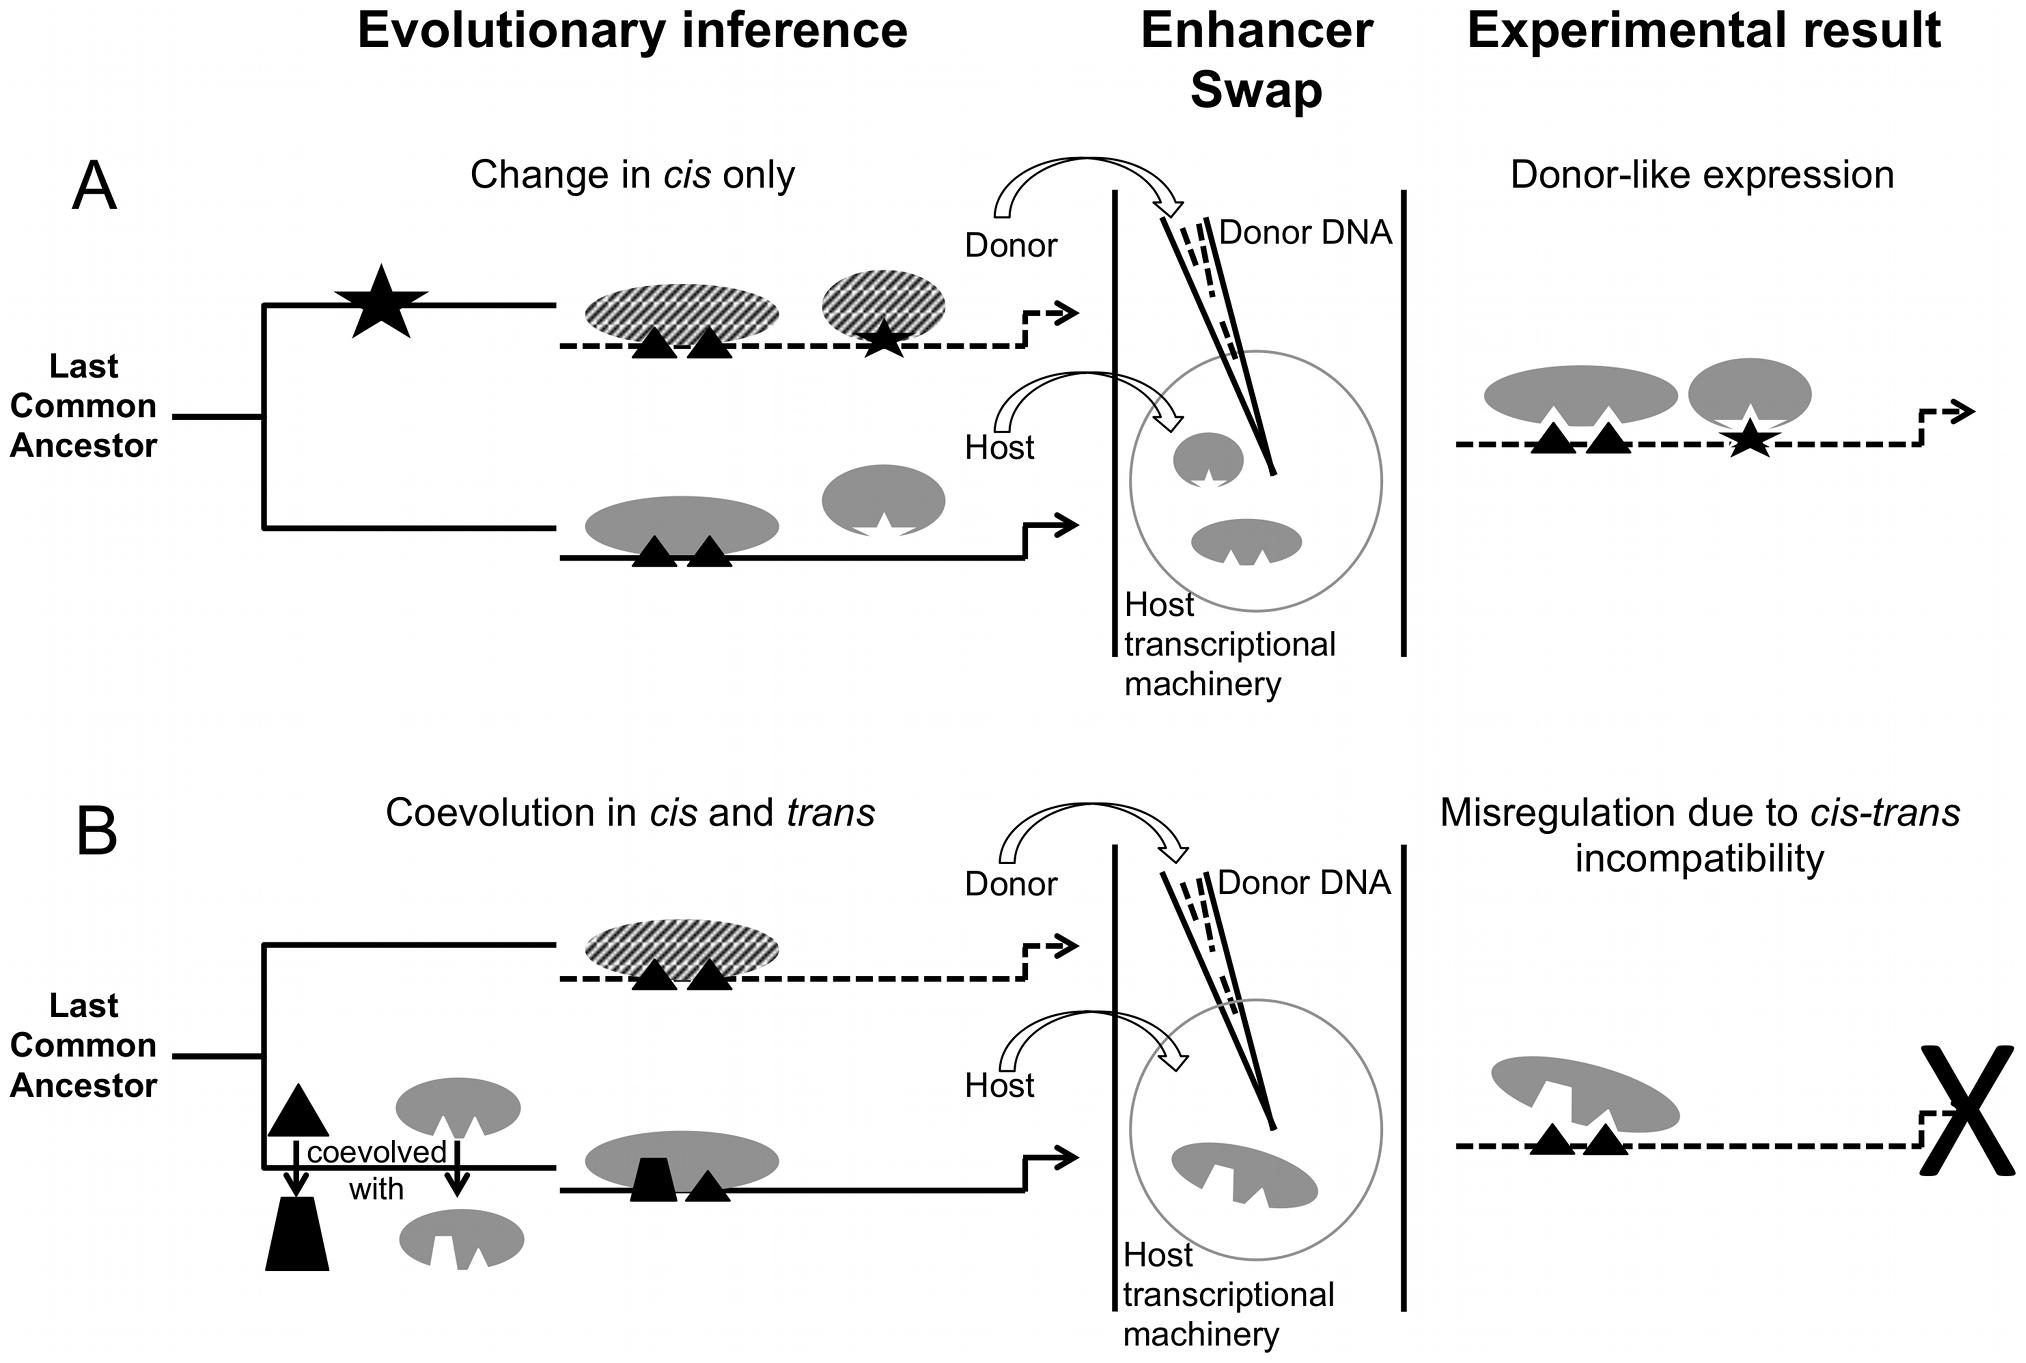 Divergence and misregulation proceed through different molecular mechanisms.